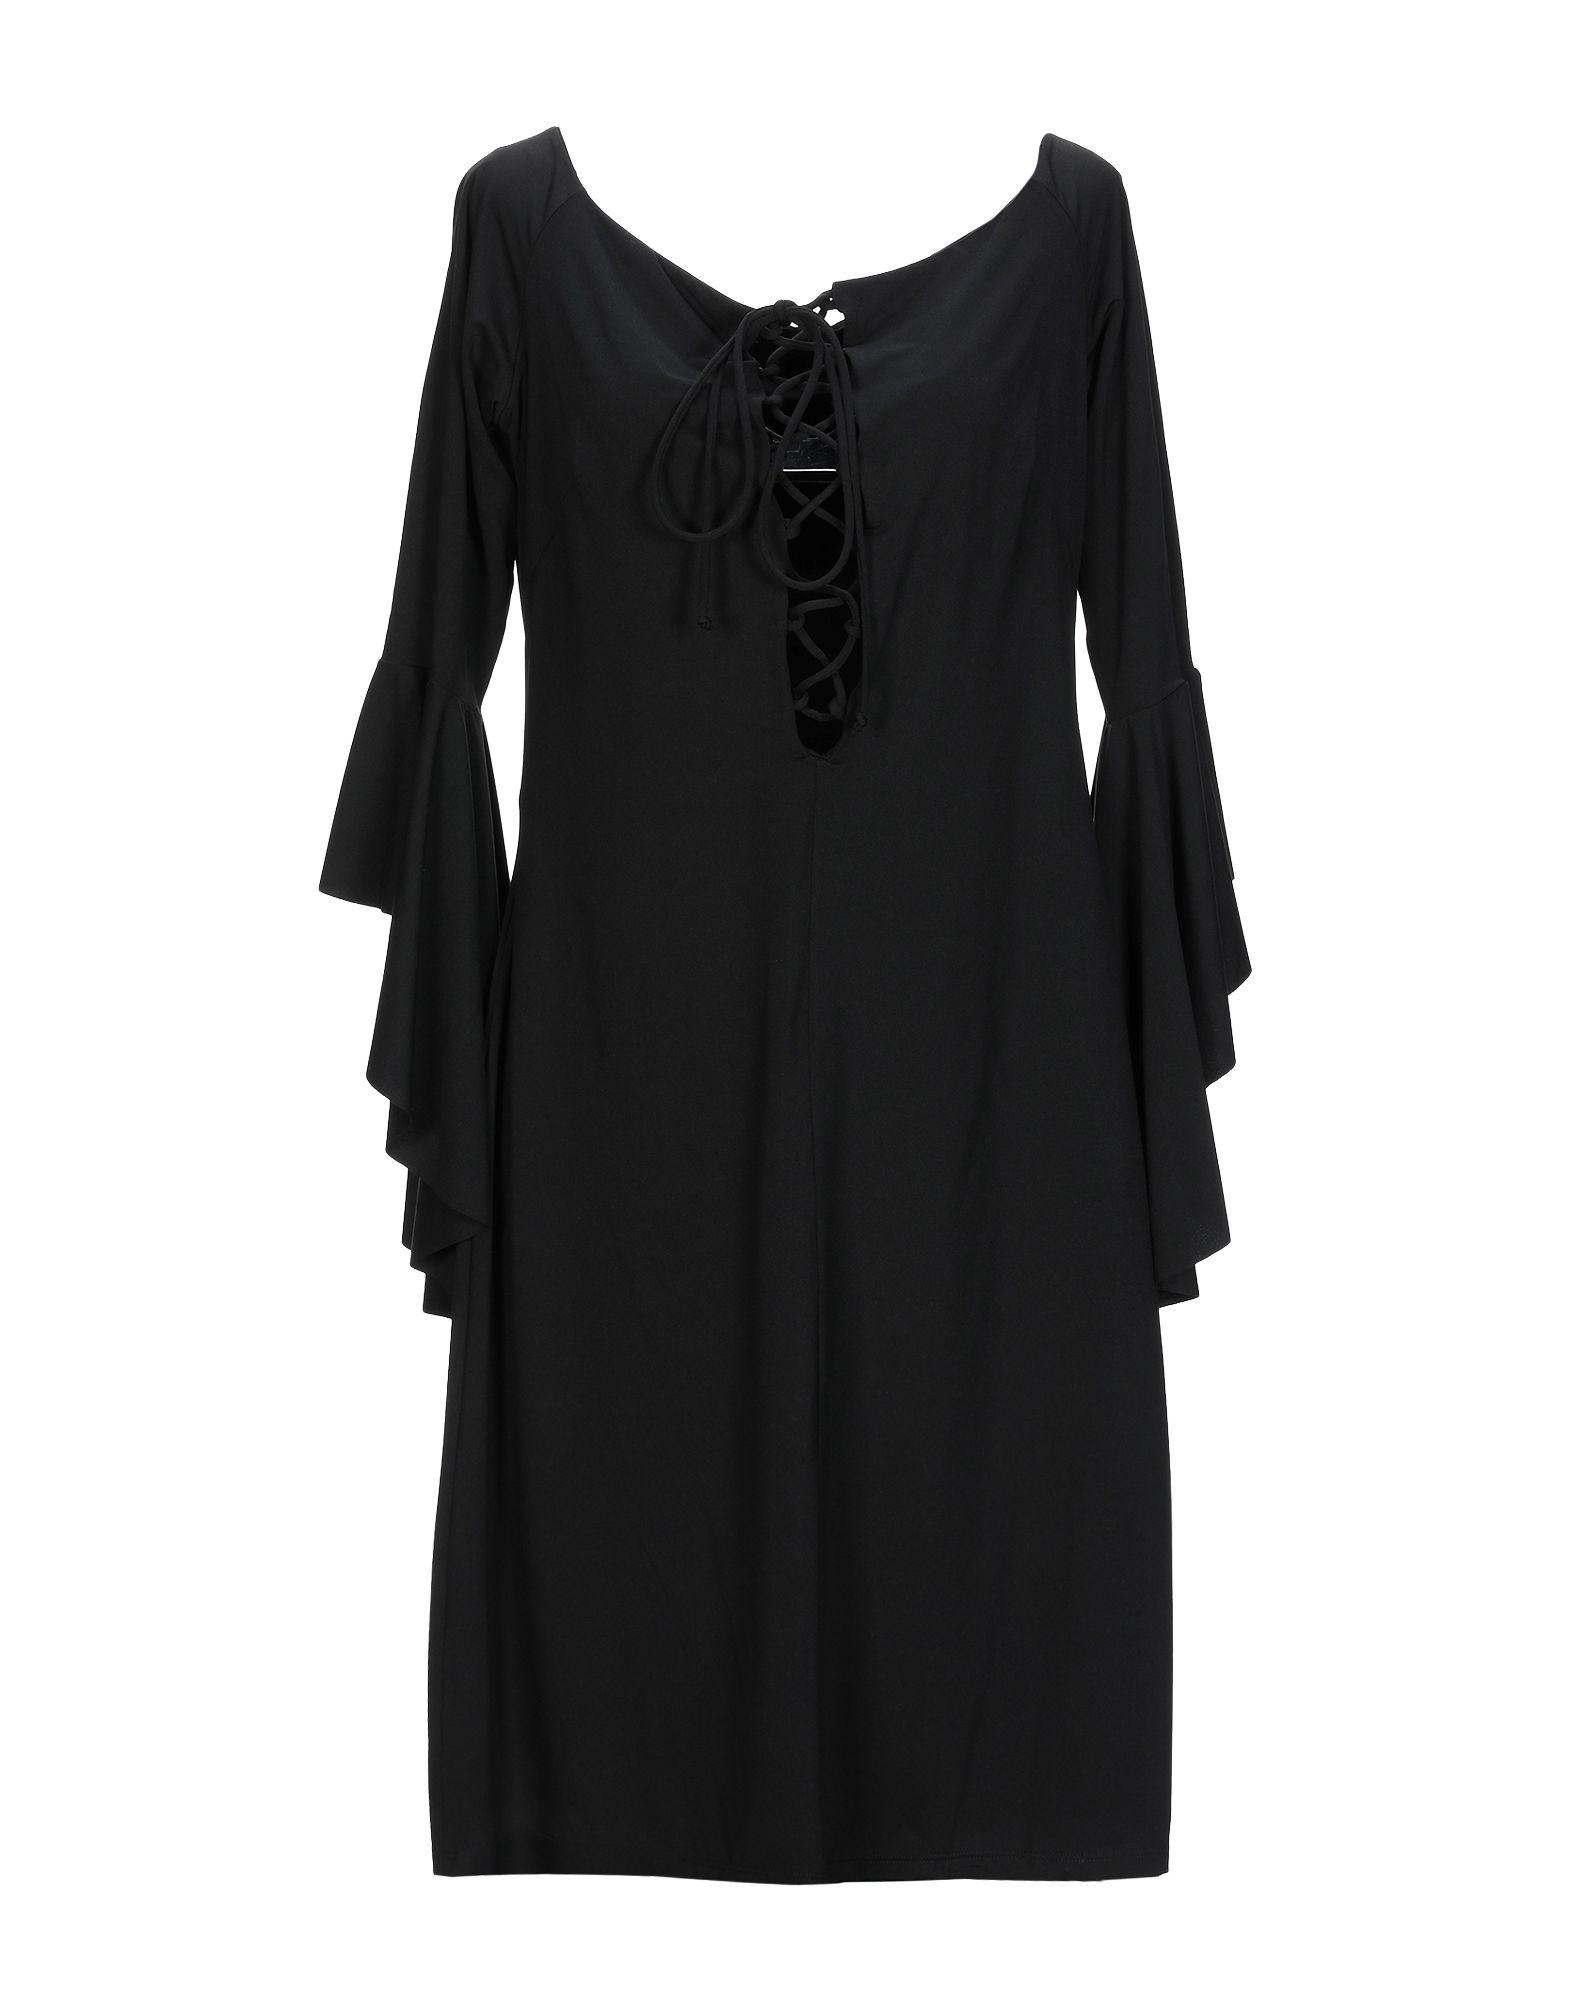 Robe Yoox Courtes Fisico Courte Sur Robes 34920488gq Femme wxwHOSaq